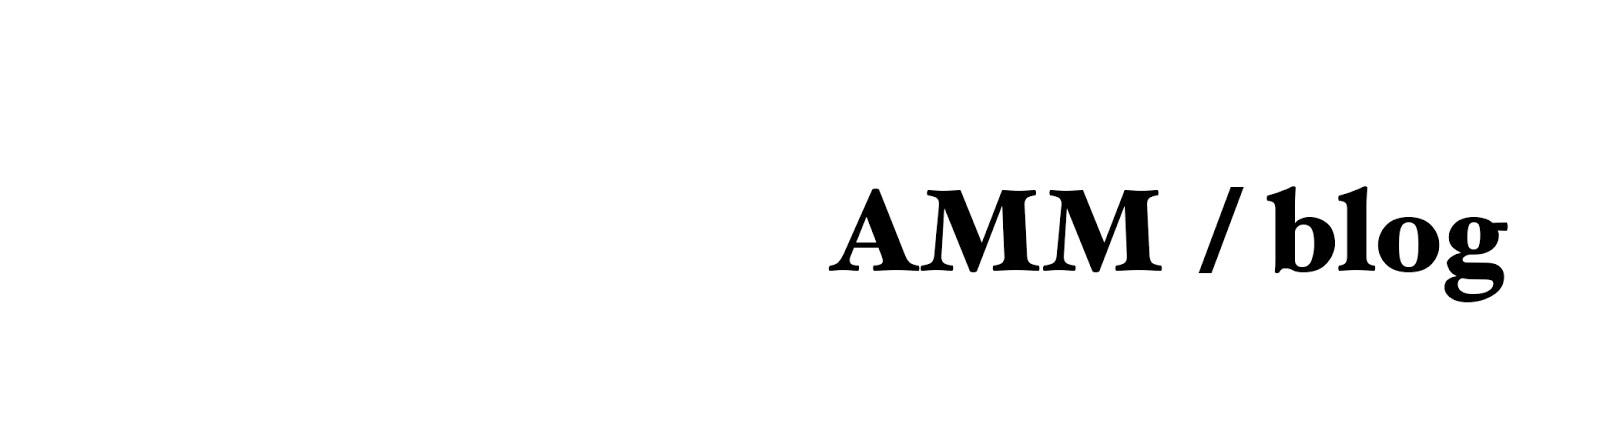 AMM blog